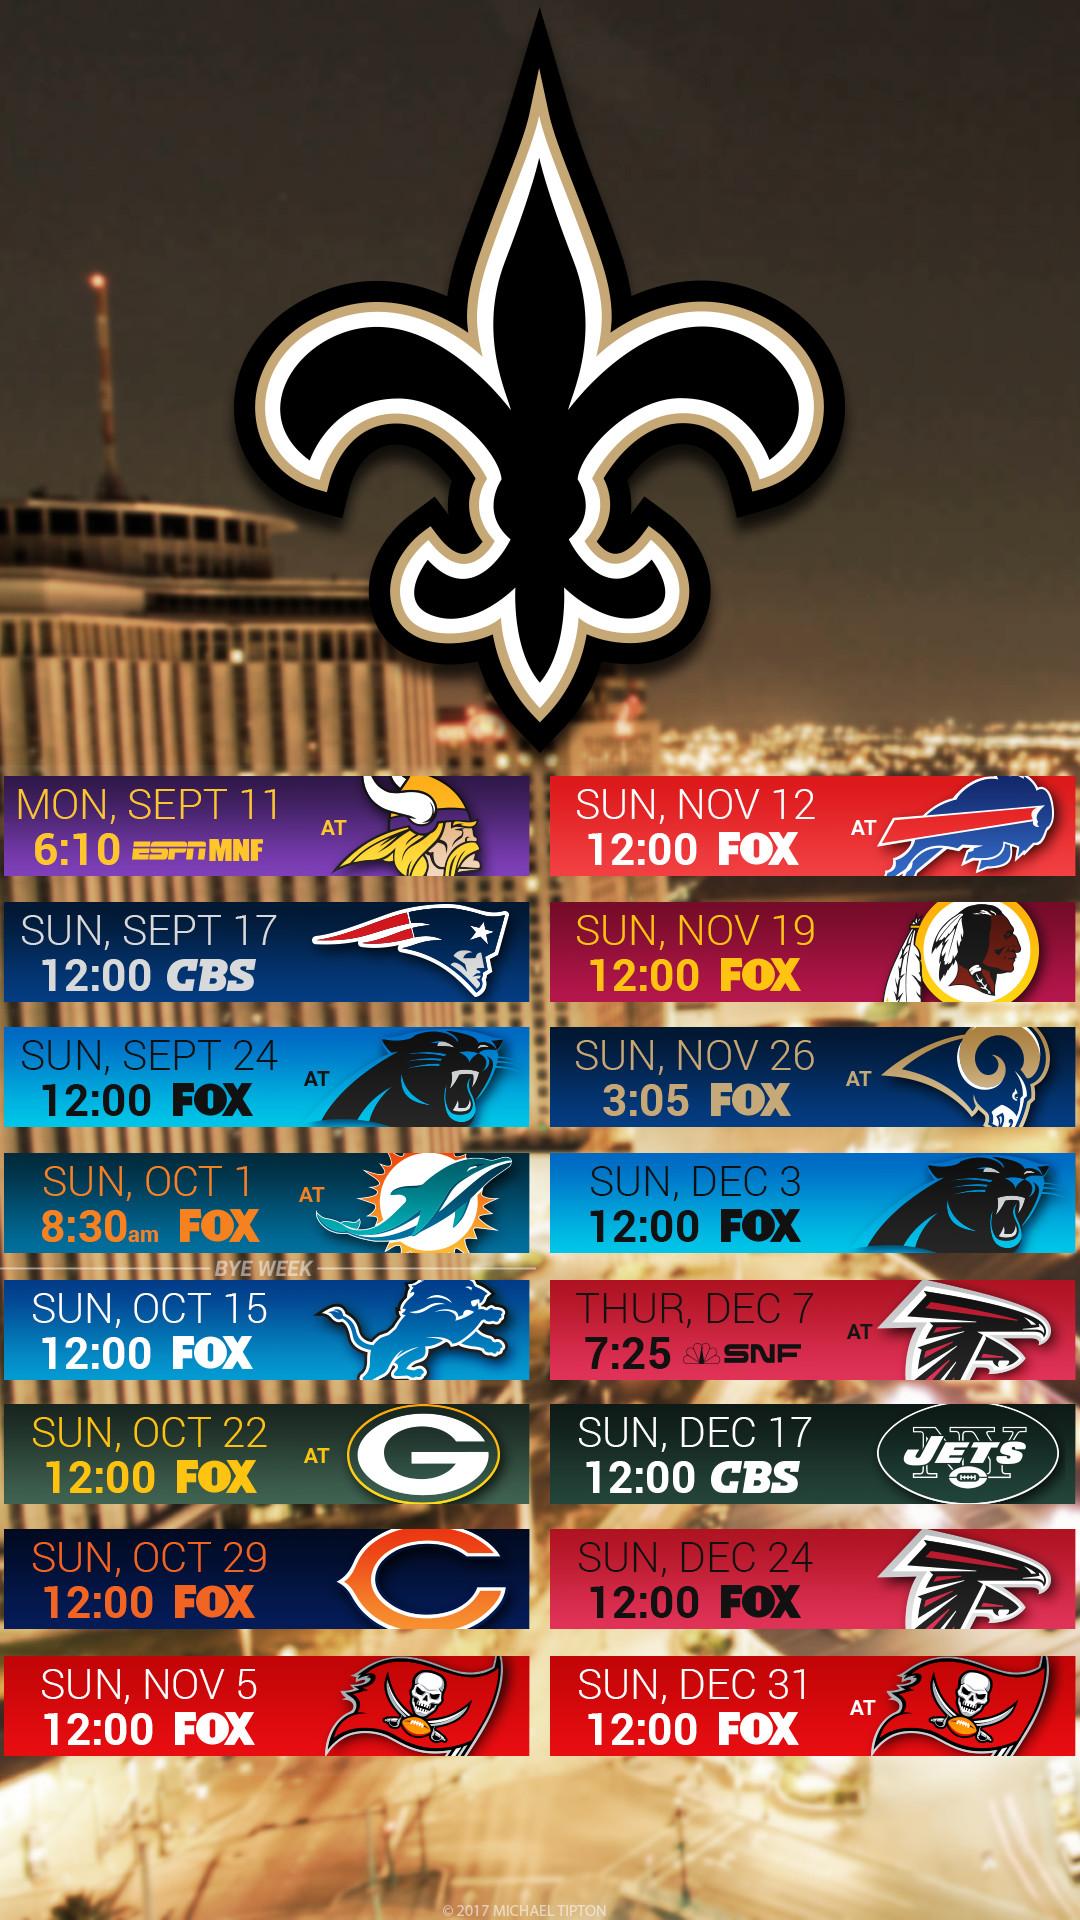 New Orleans Saints Iphone Wallpaper New Orleans Saints 2017 Wallpaper 183 ① Wallpapertag